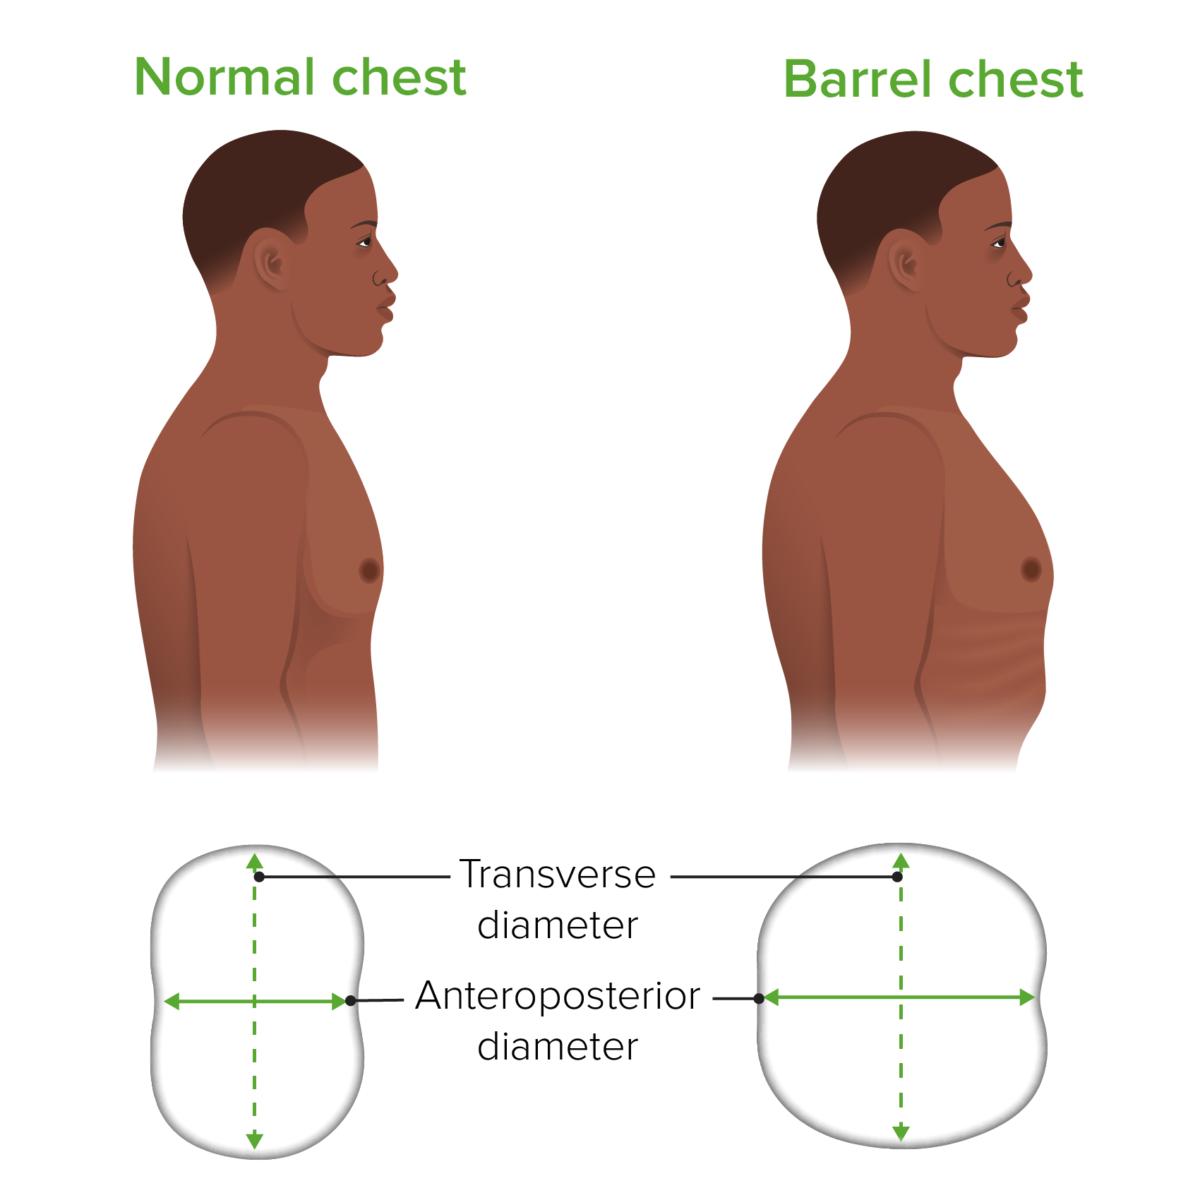 Barrel chest Emphysema